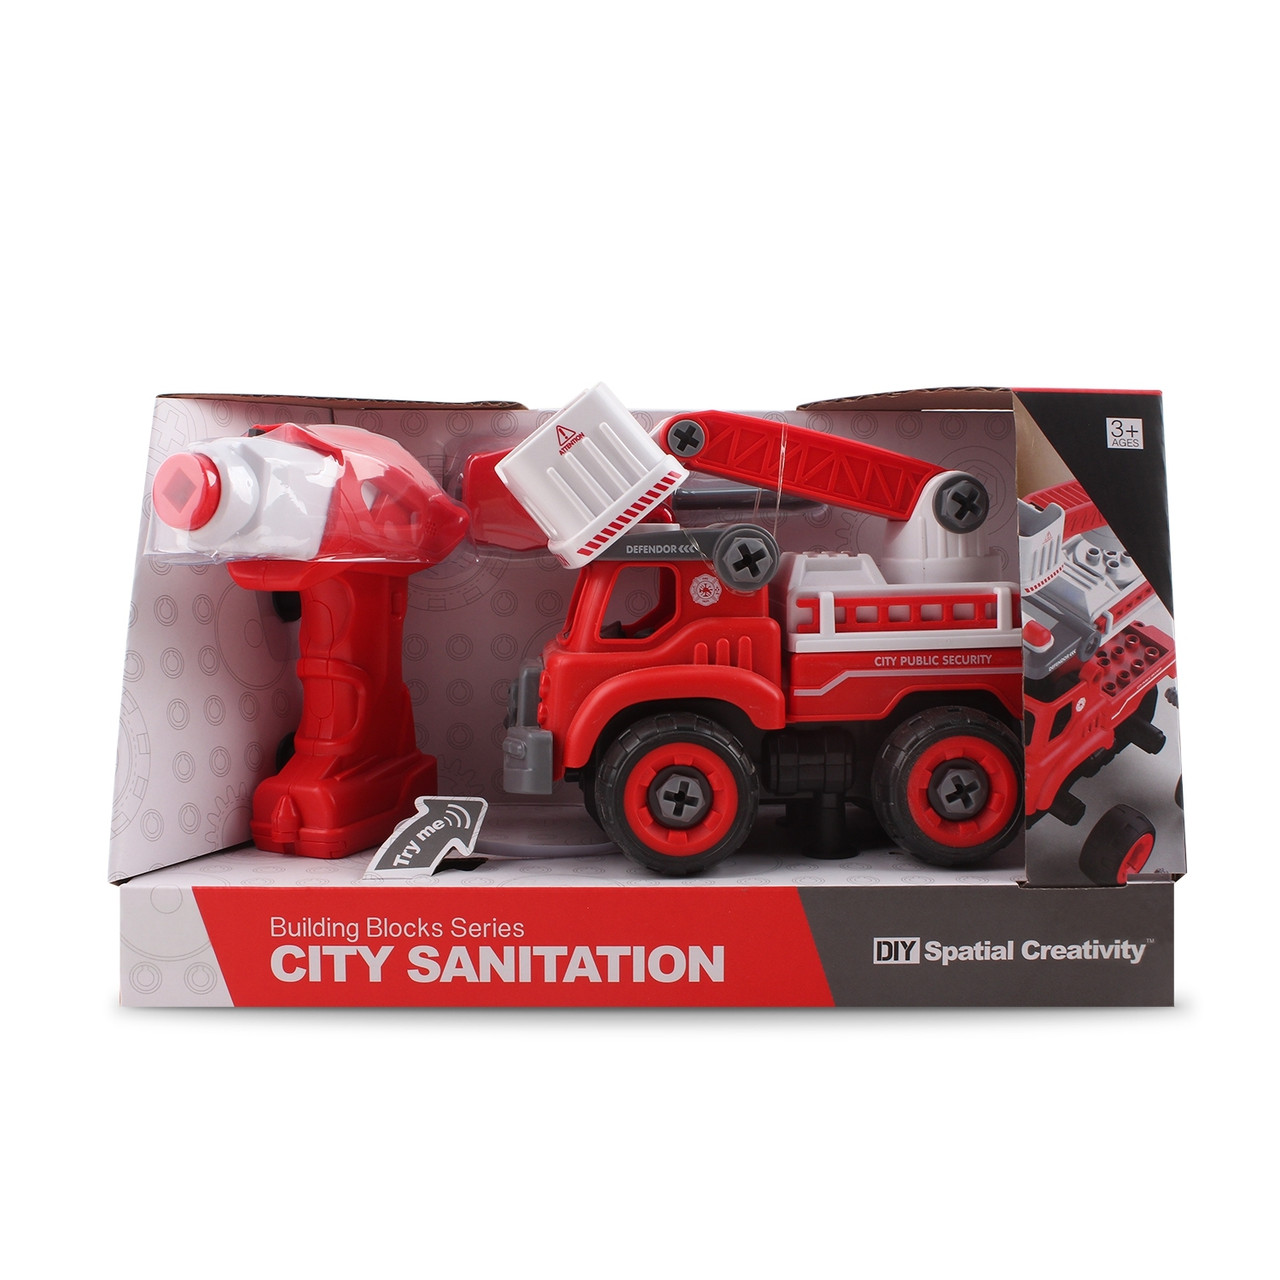 Пожарная машина с лестницей- конструктор, на р/у  Hulna 2030013